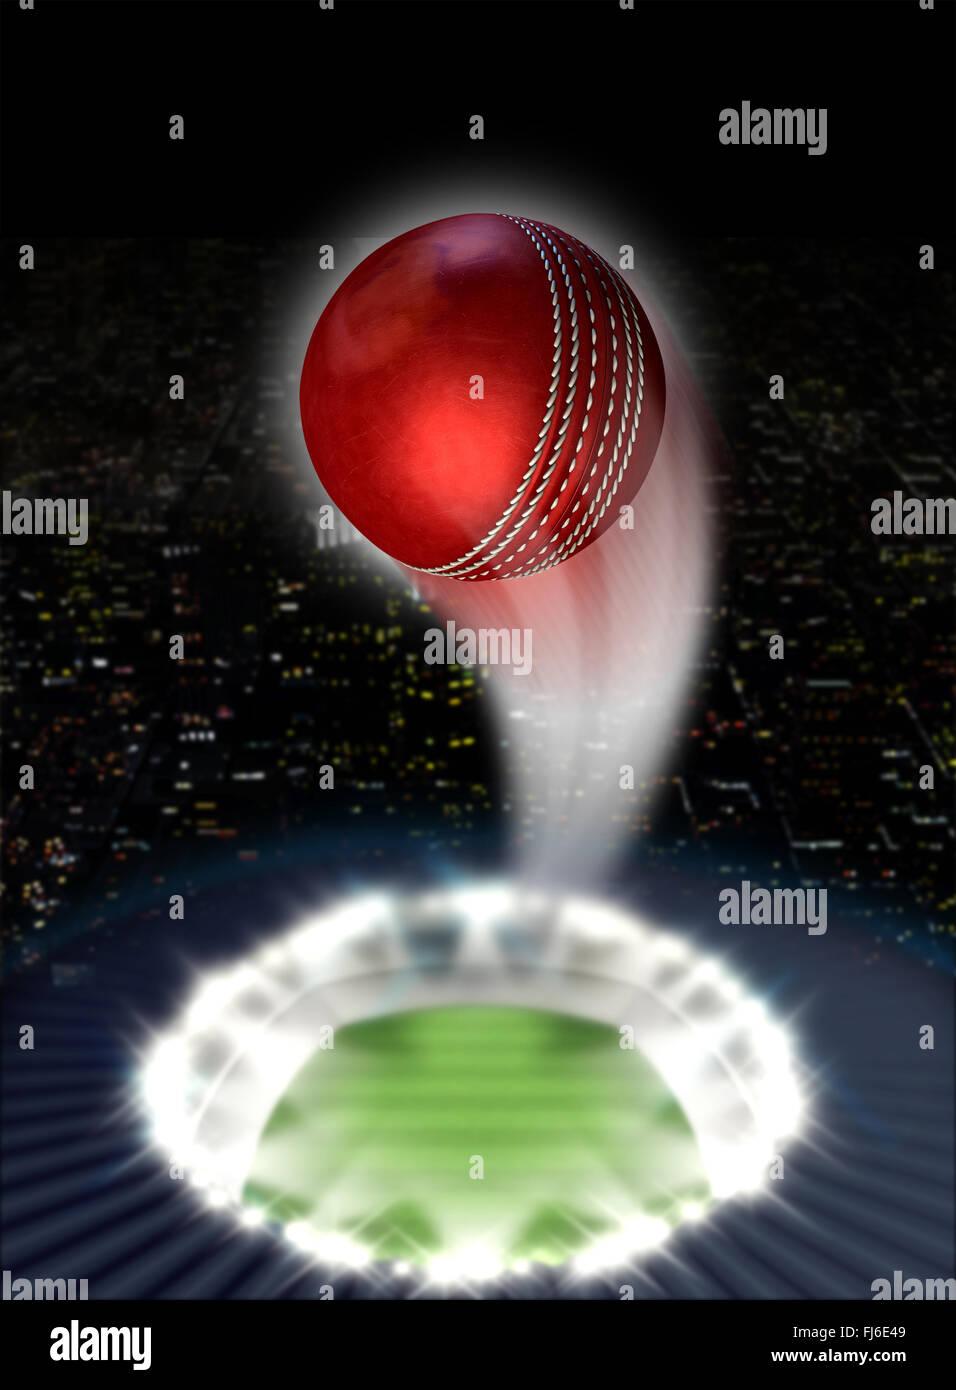 cricket stadium red leather cricket stock photos  u0026 cricket stadium red leather cricket stock